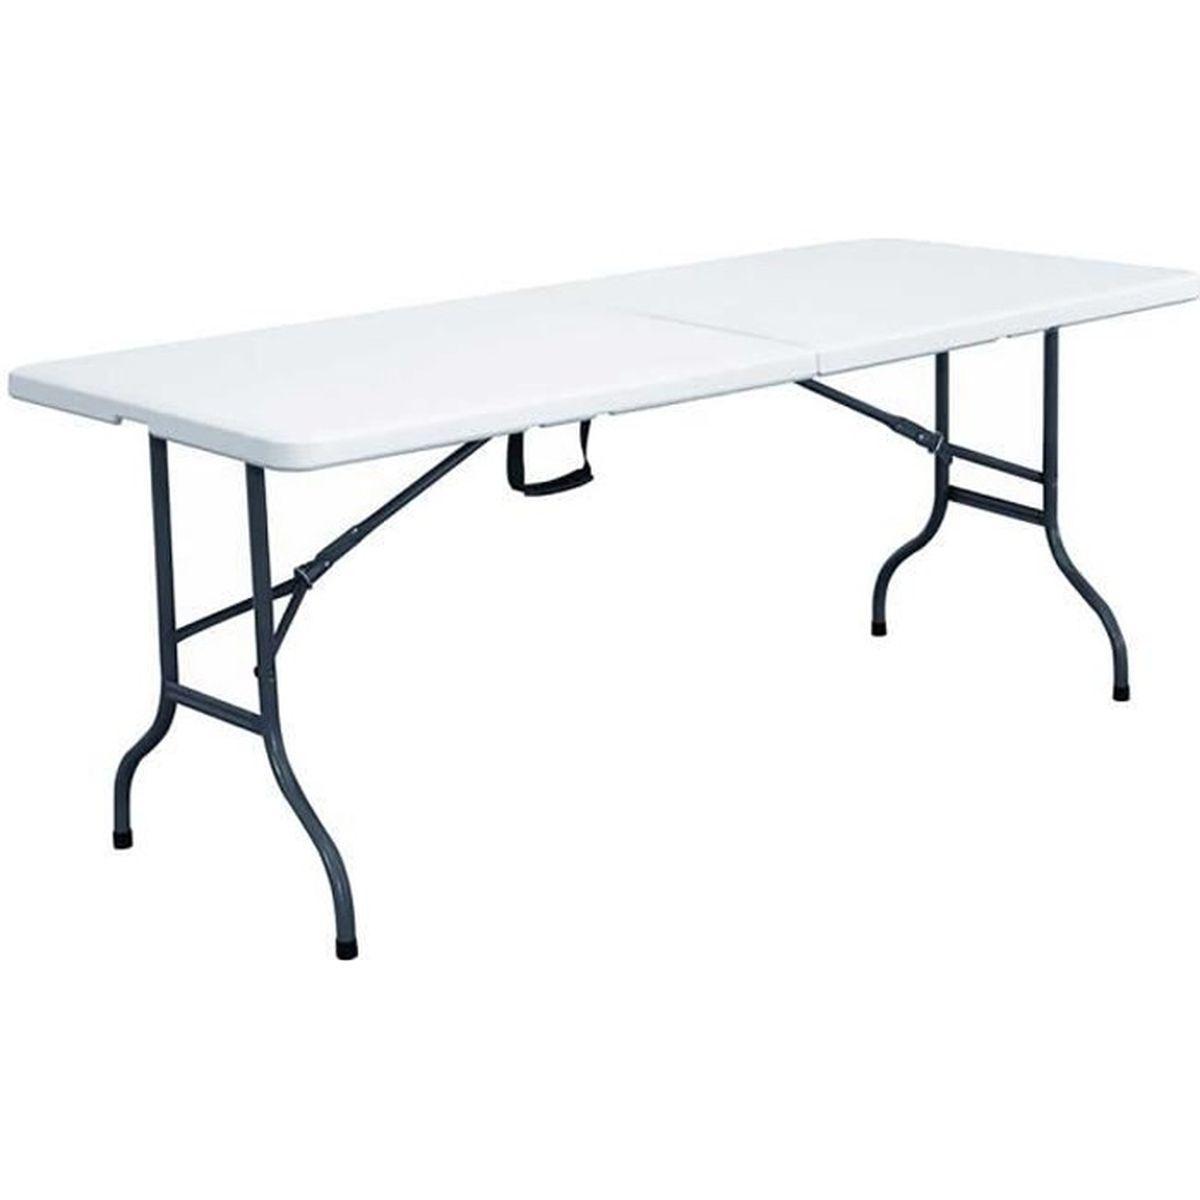 TABLE DE JARDIN  Table pliante 152cm table pliable portable